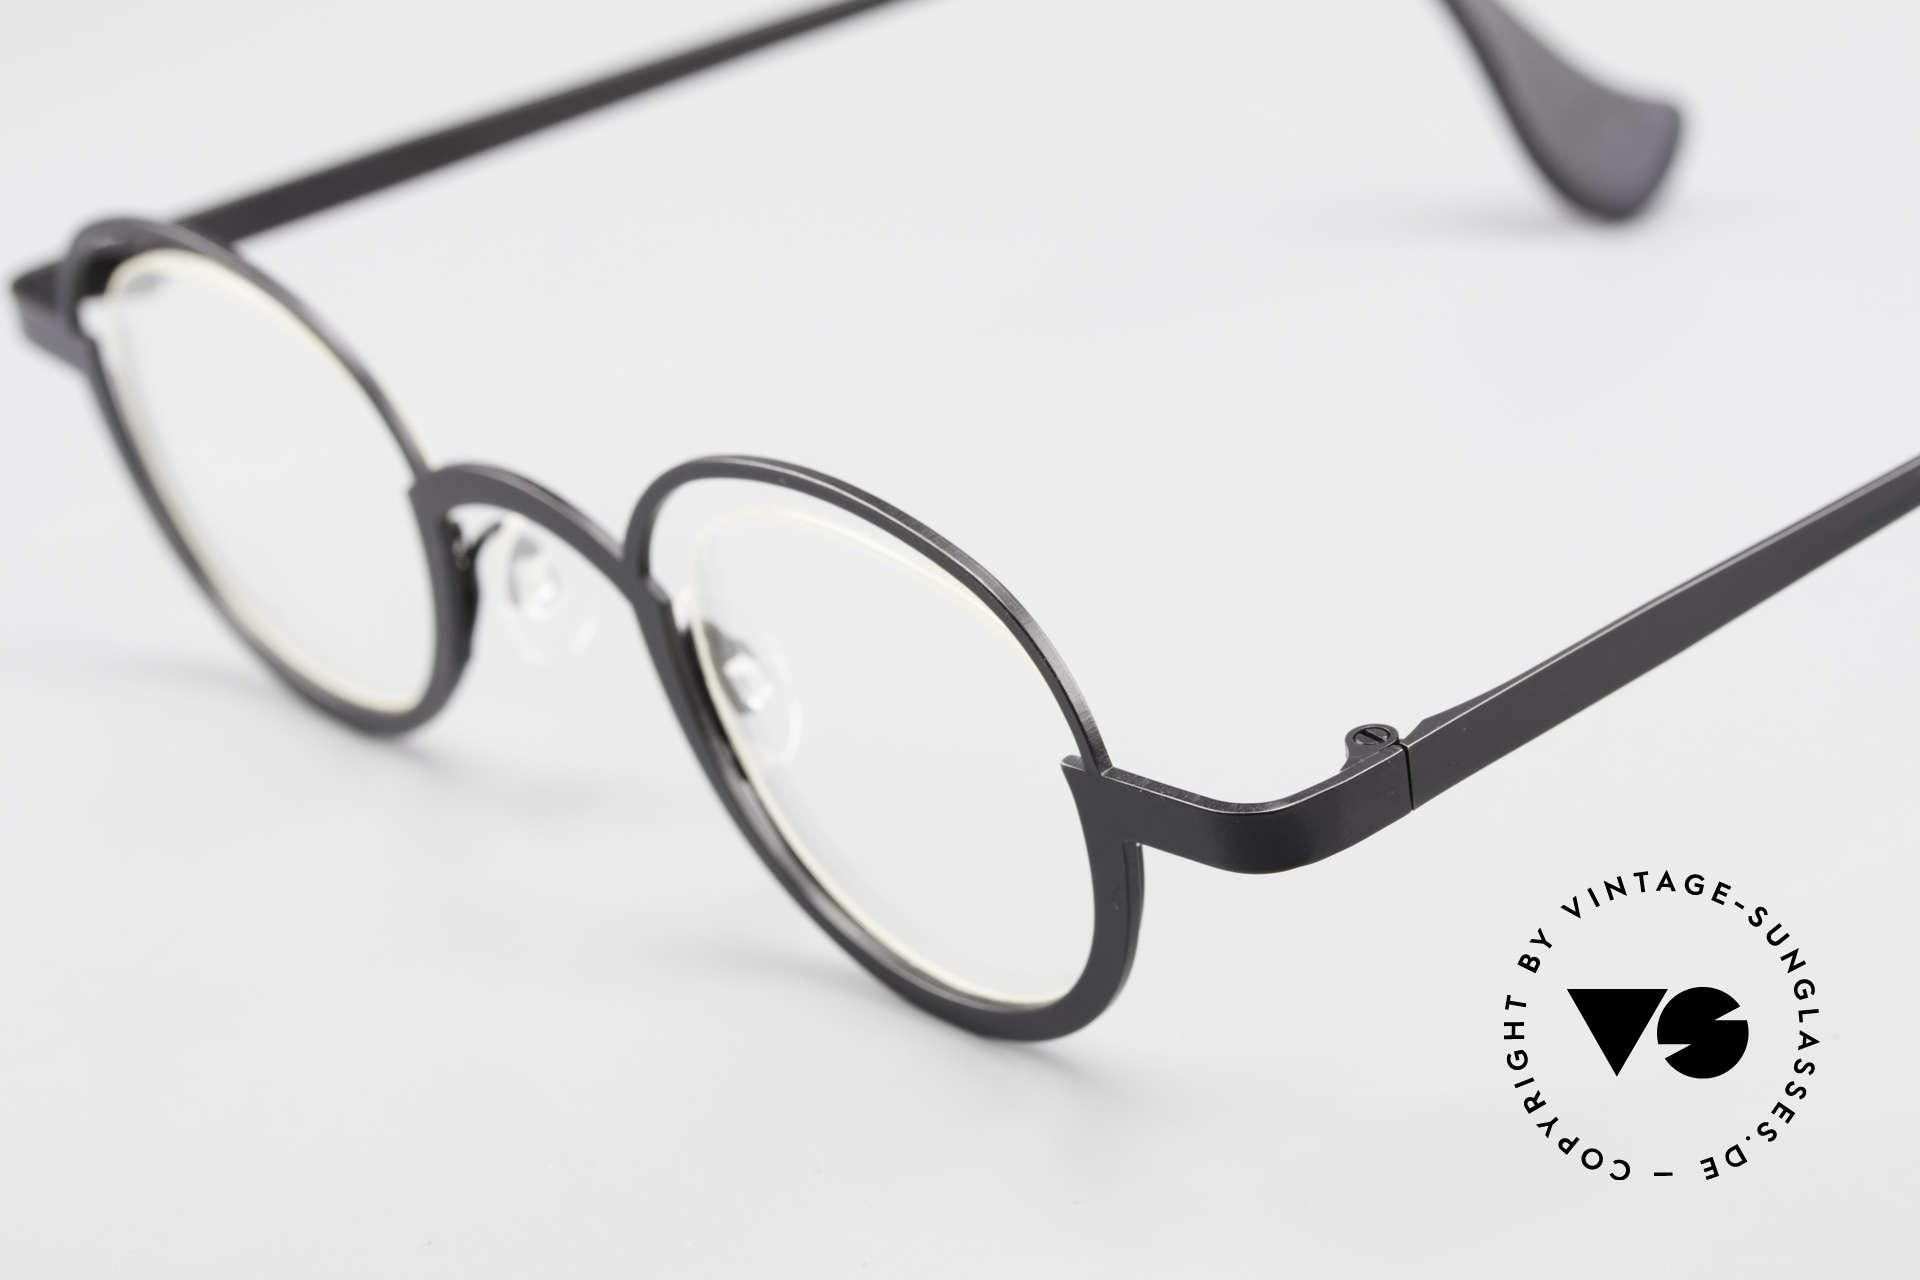 Theo Belgium Dozy Slim Rimless 90's Metal Eyeglasses, an extraordinary designer piece by THEO BELGIUM, Made for Men and Women